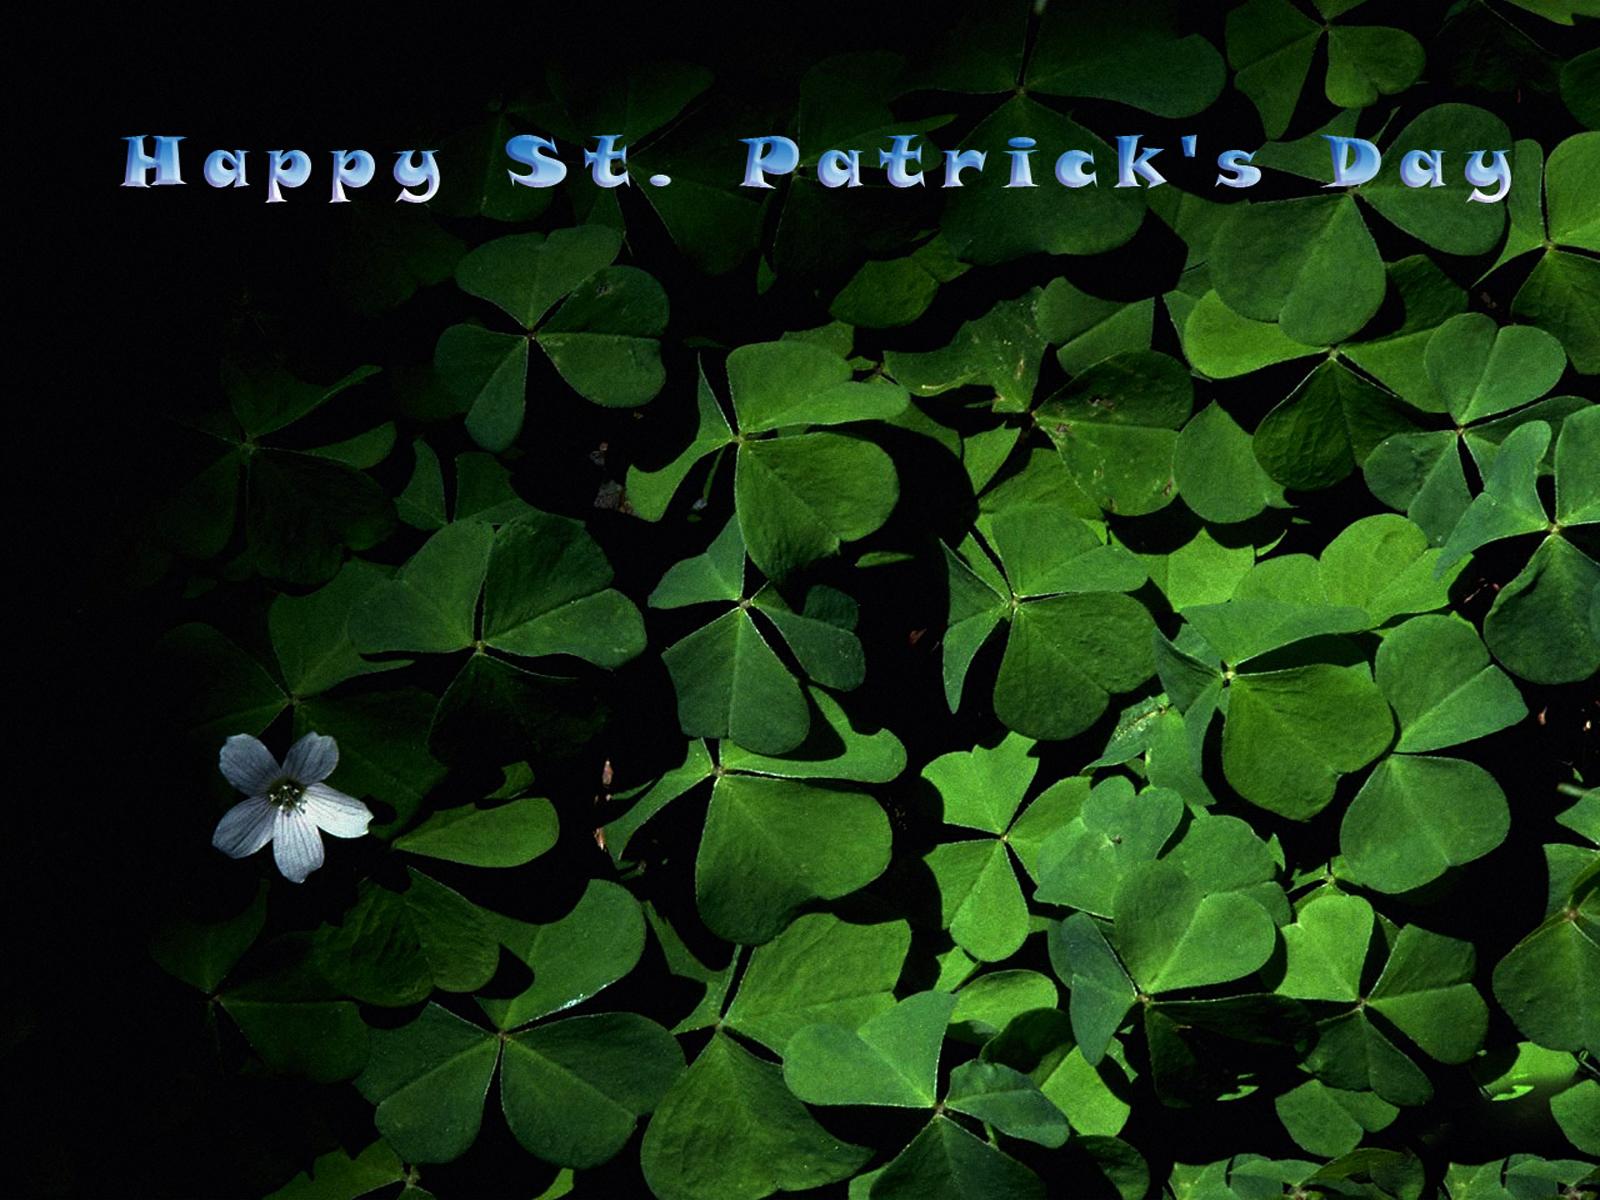 Happy St Patricks Day 2011 computer desktop wallpapers 1600x1200